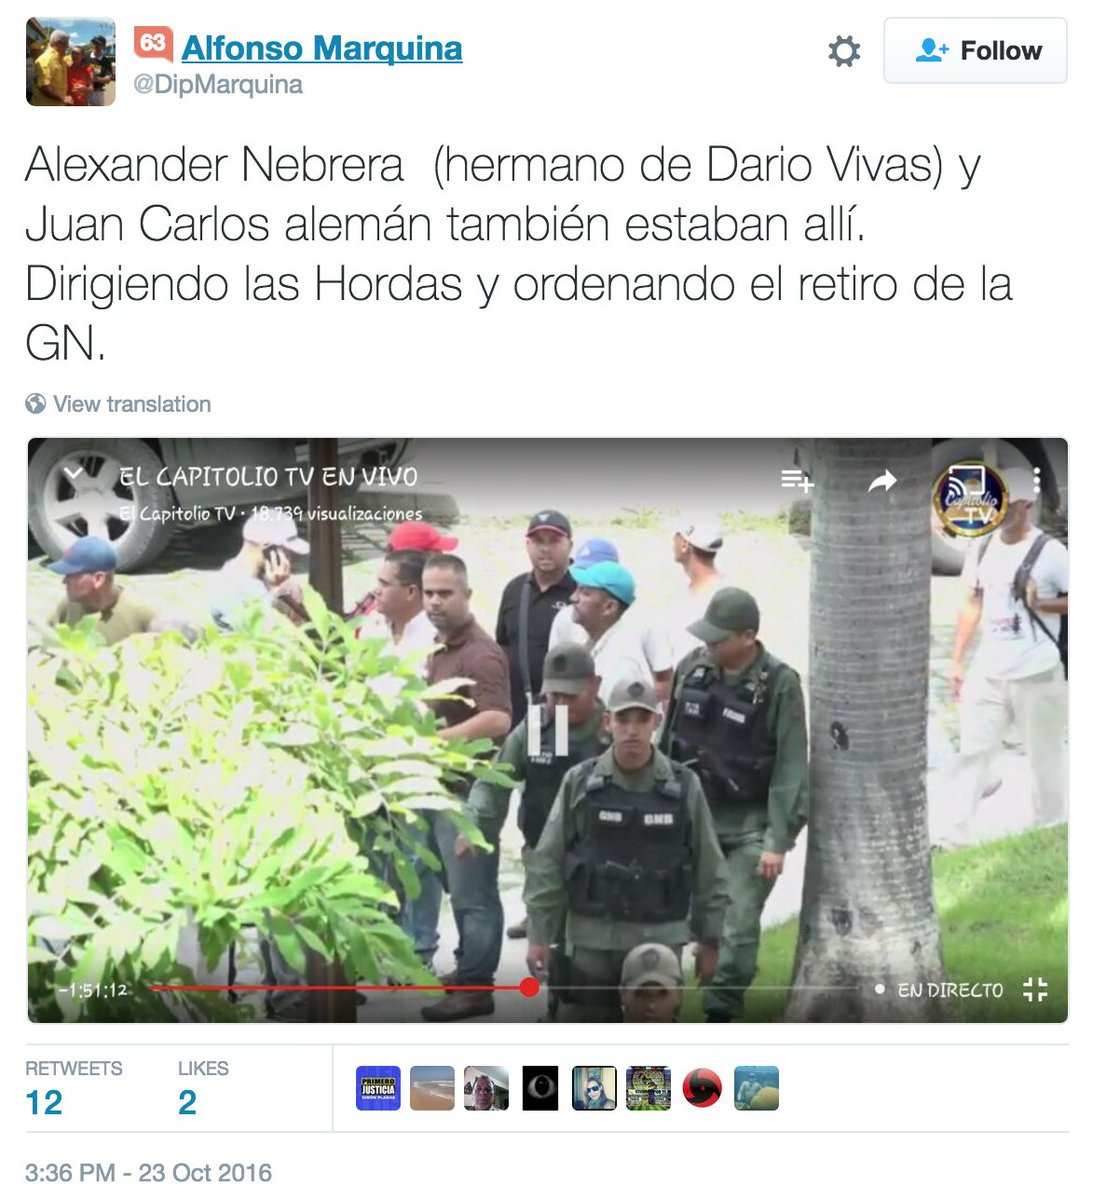 Marquina borró este tweet... https://t.co/XG3DTGi6h1